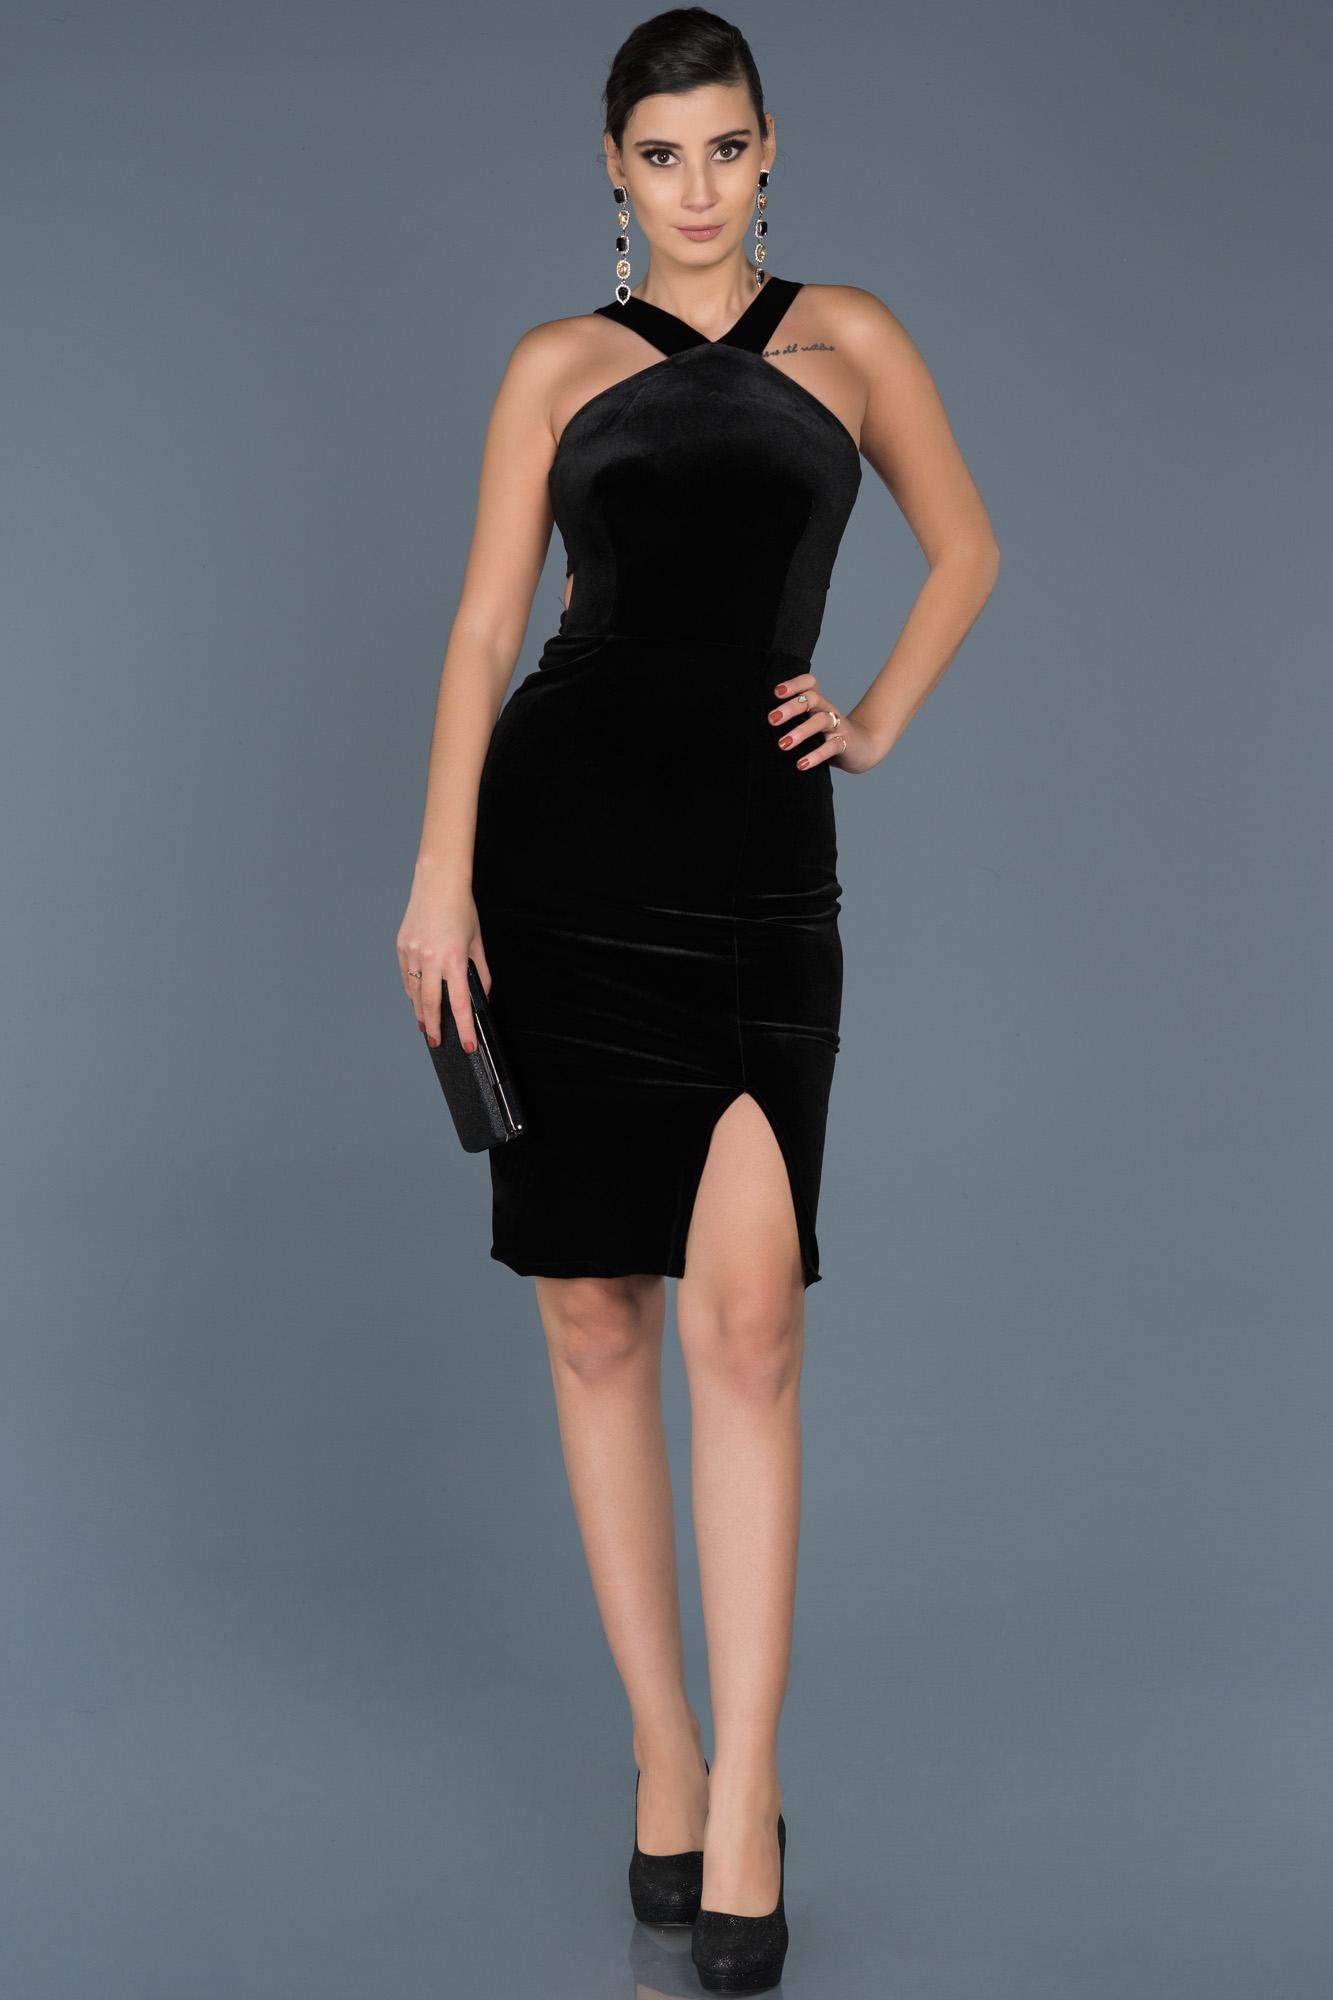 b4a8e1845f1 Short Black Velvet Evening Dress ABK261